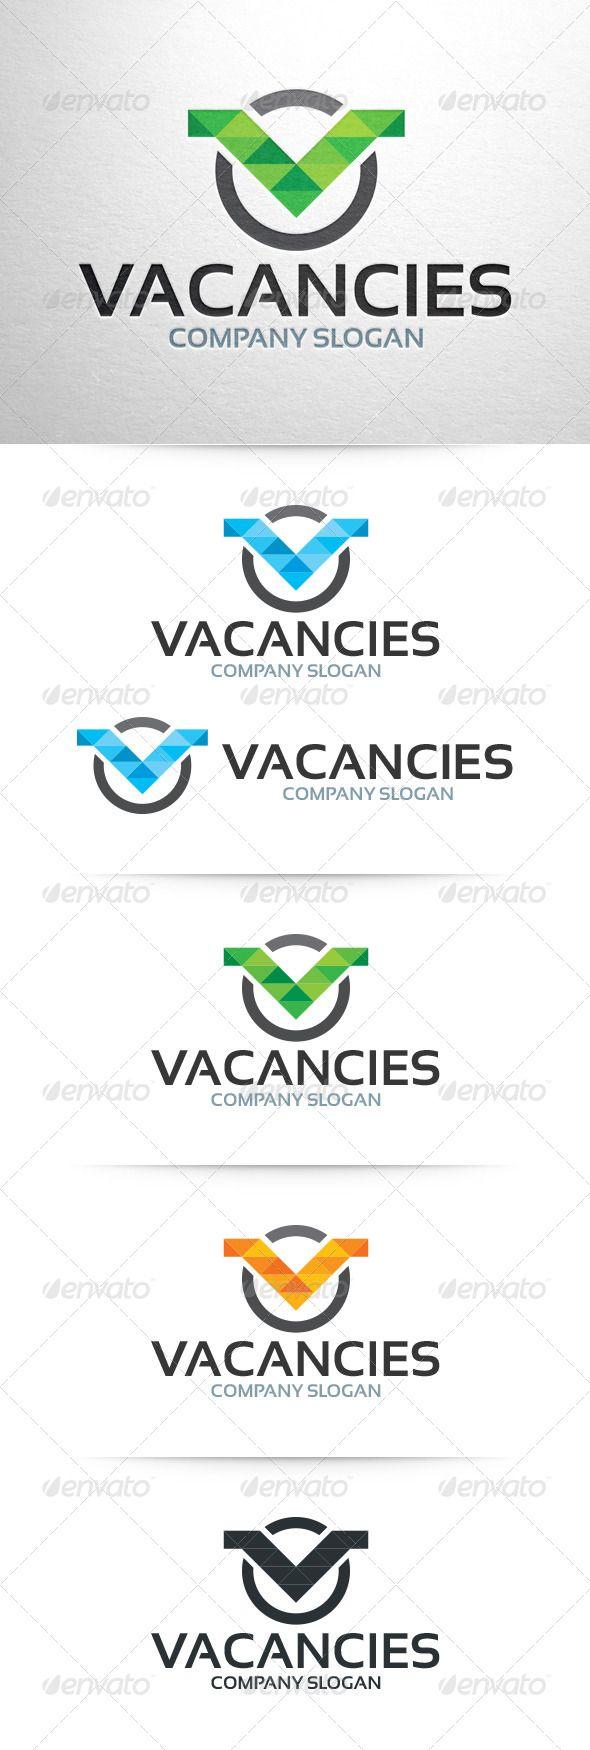 Vacancies - Letter V Logo Template (Letters)